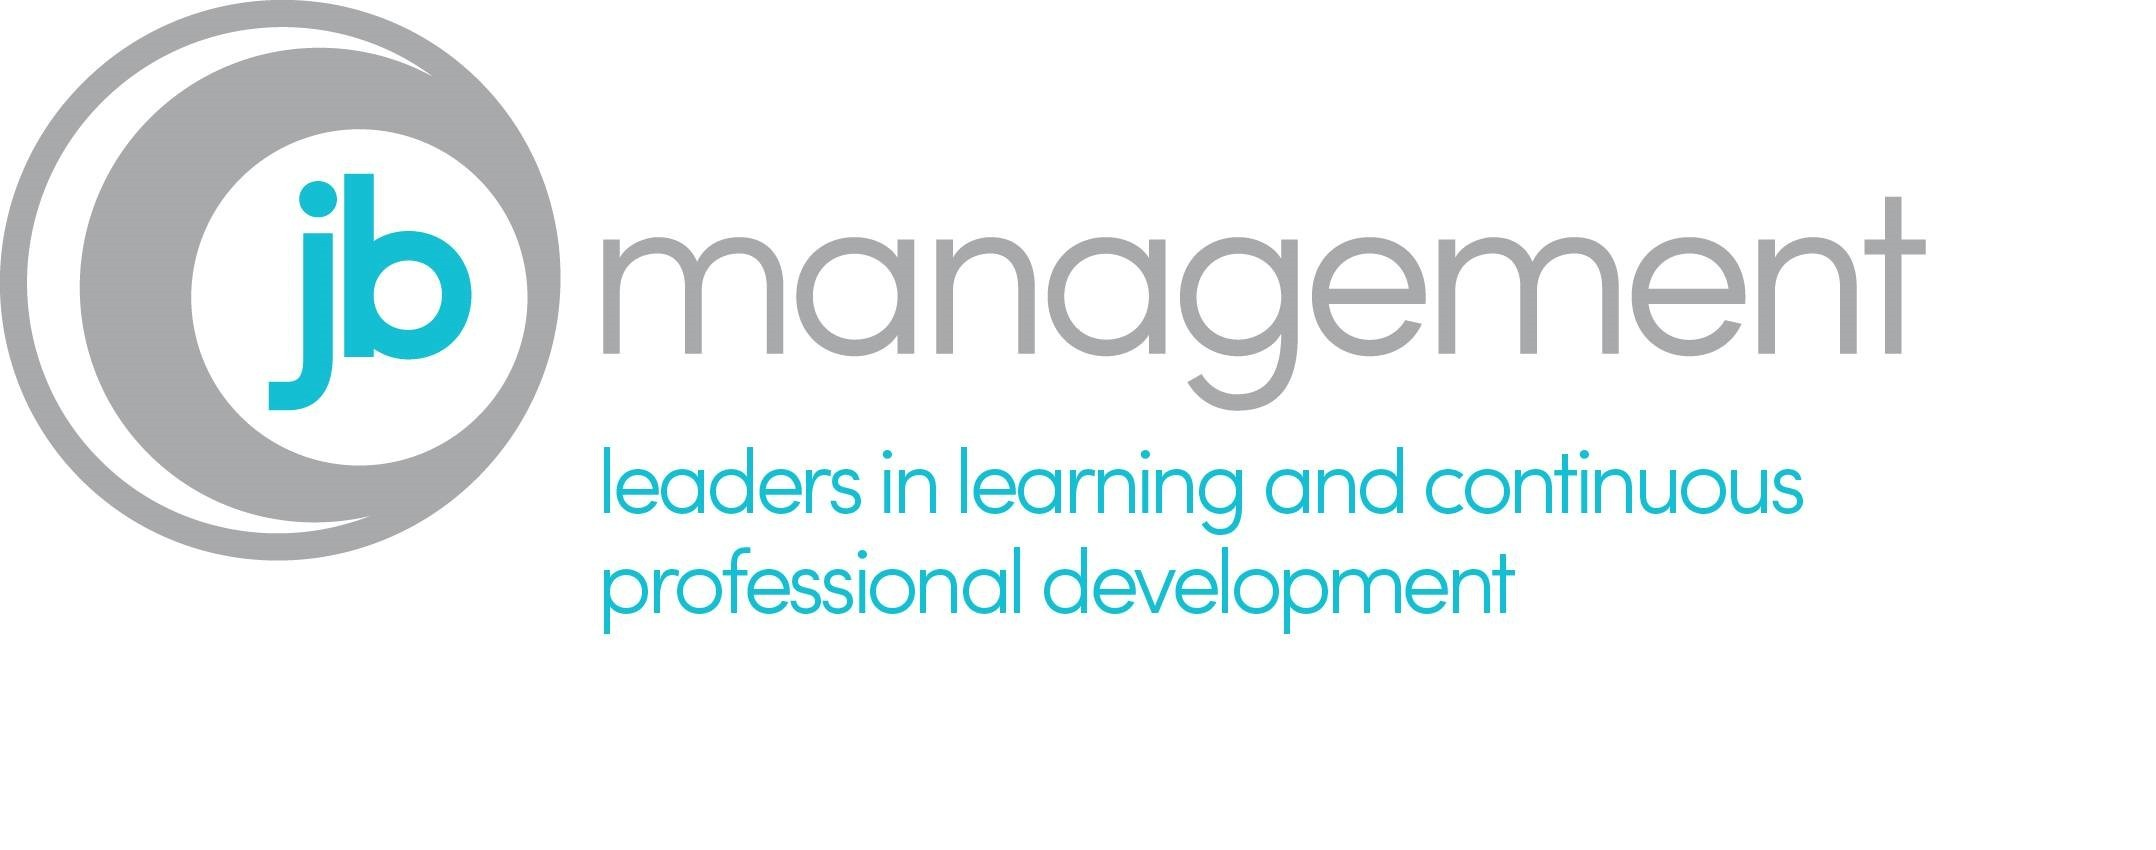 JB Management   LinkedIn